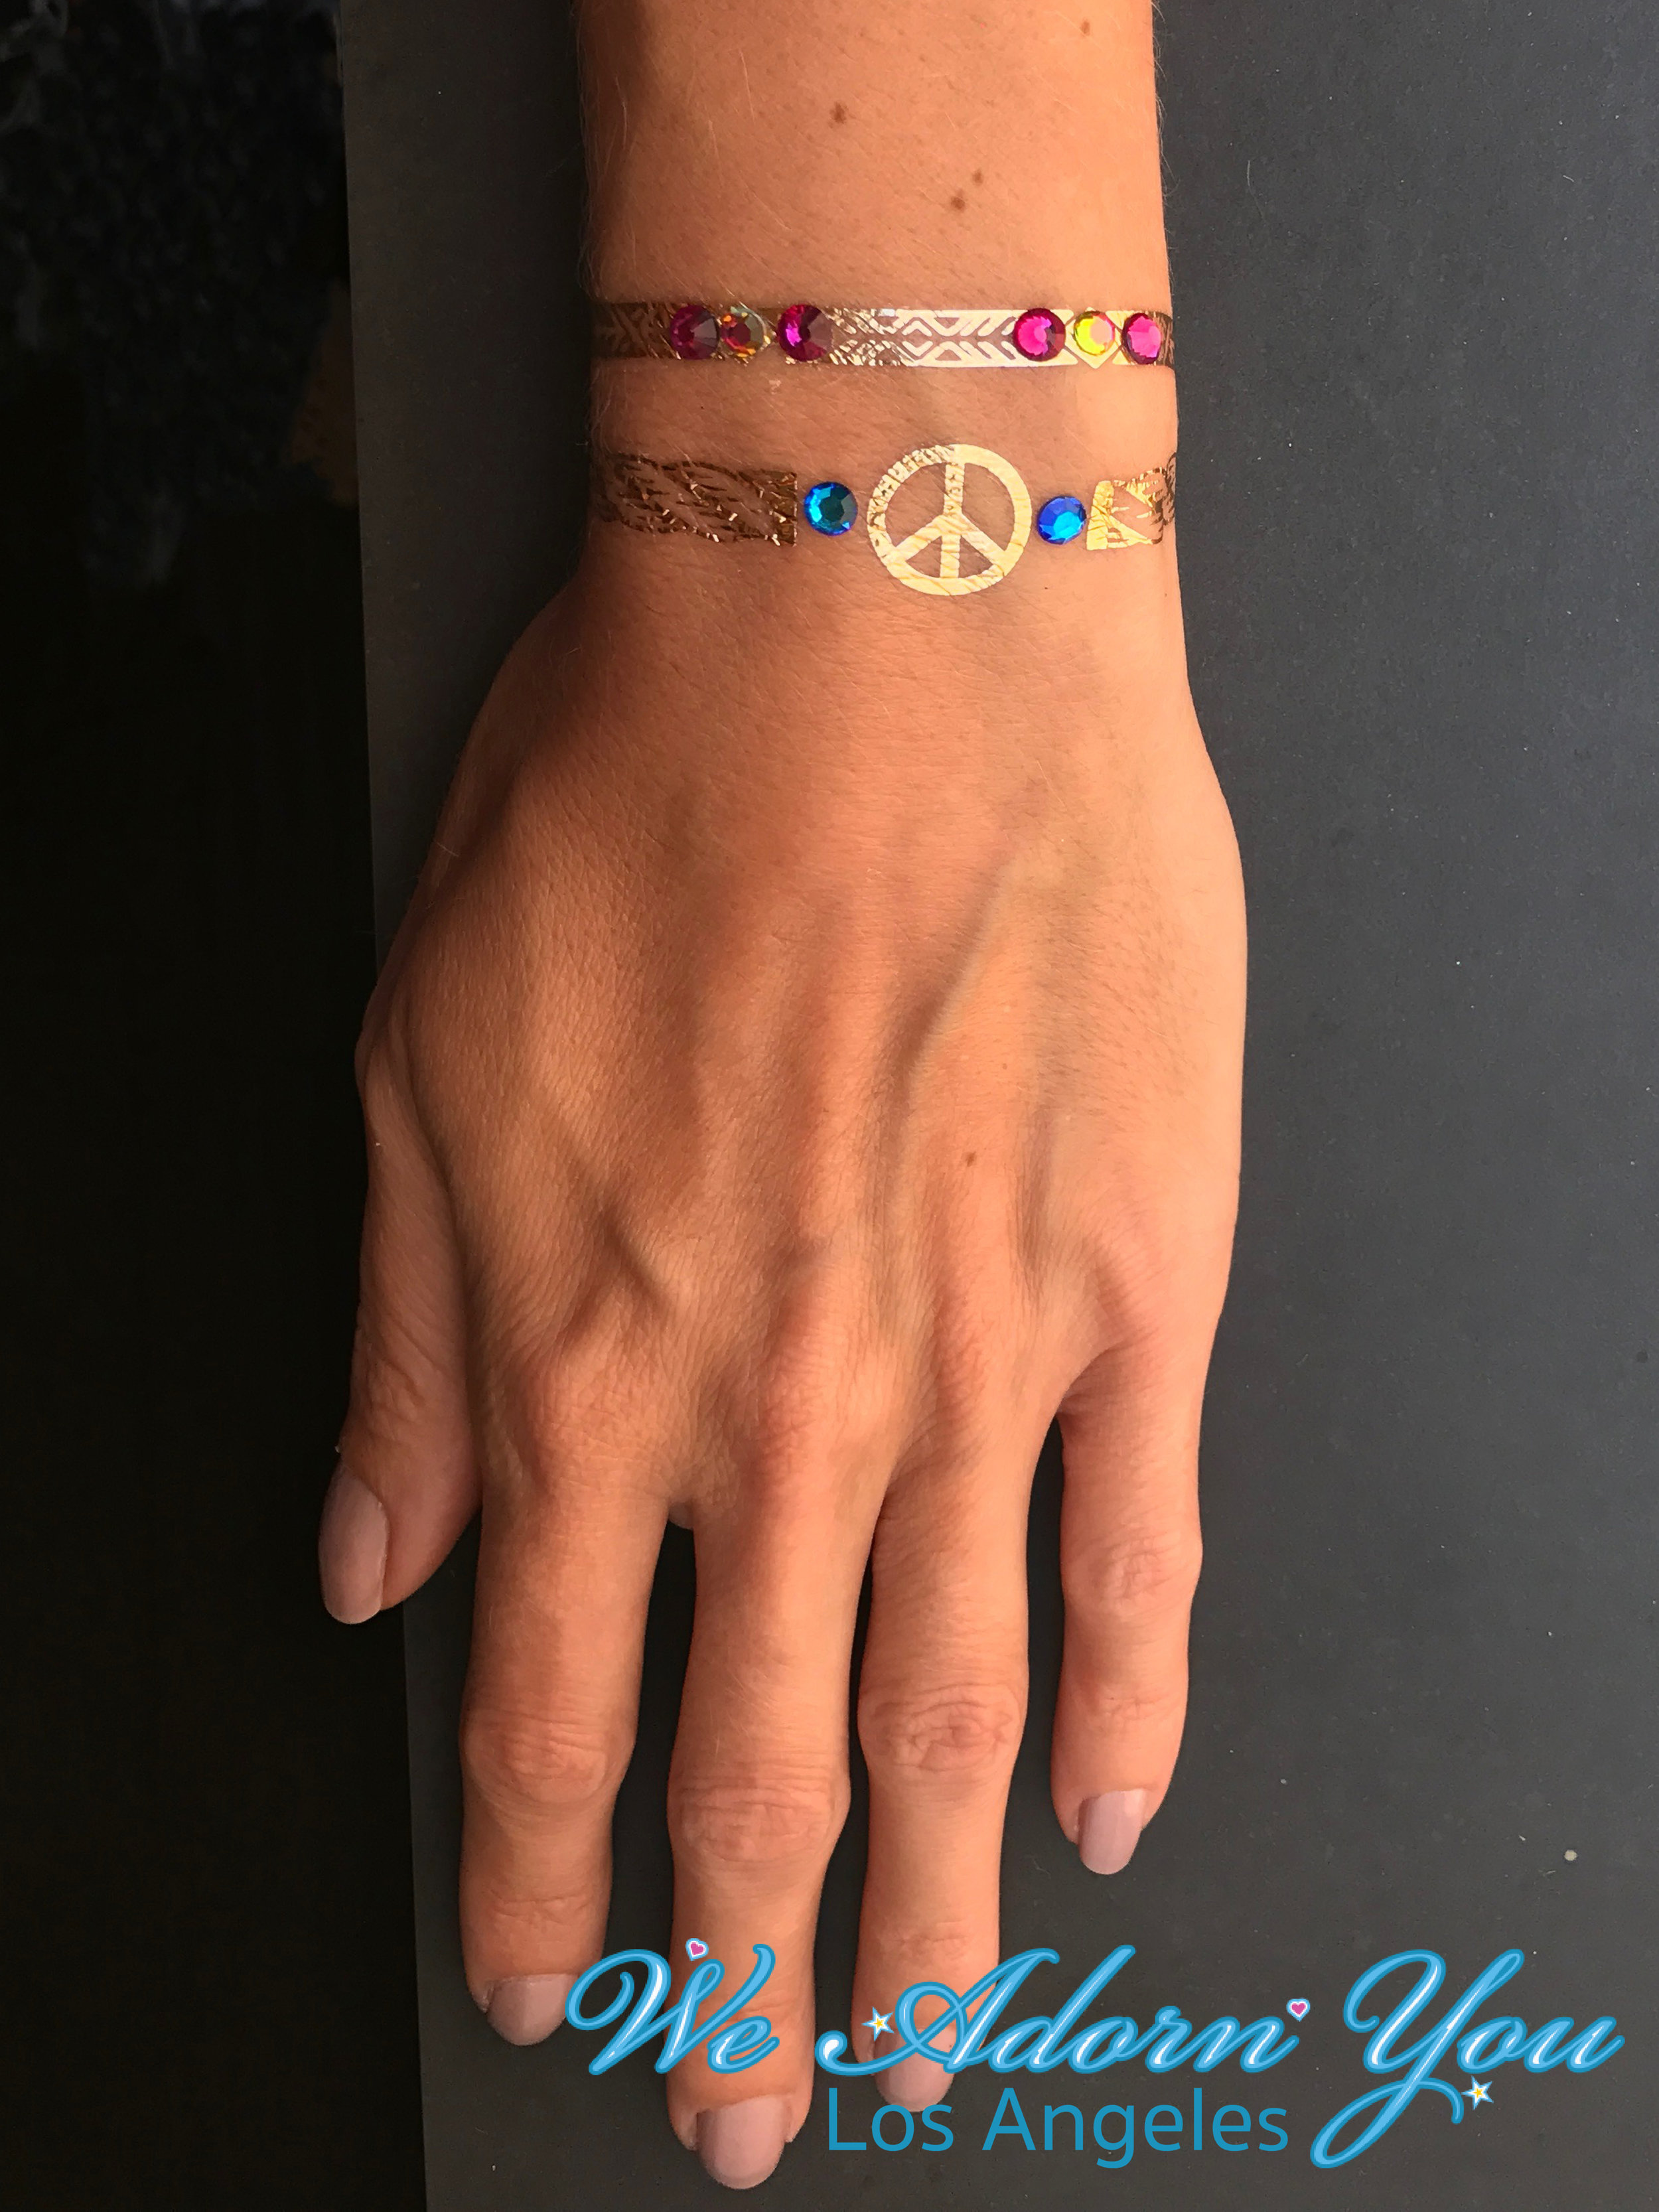 We Adorn You Los Angeles Metallic Tattoos Gems.jpg